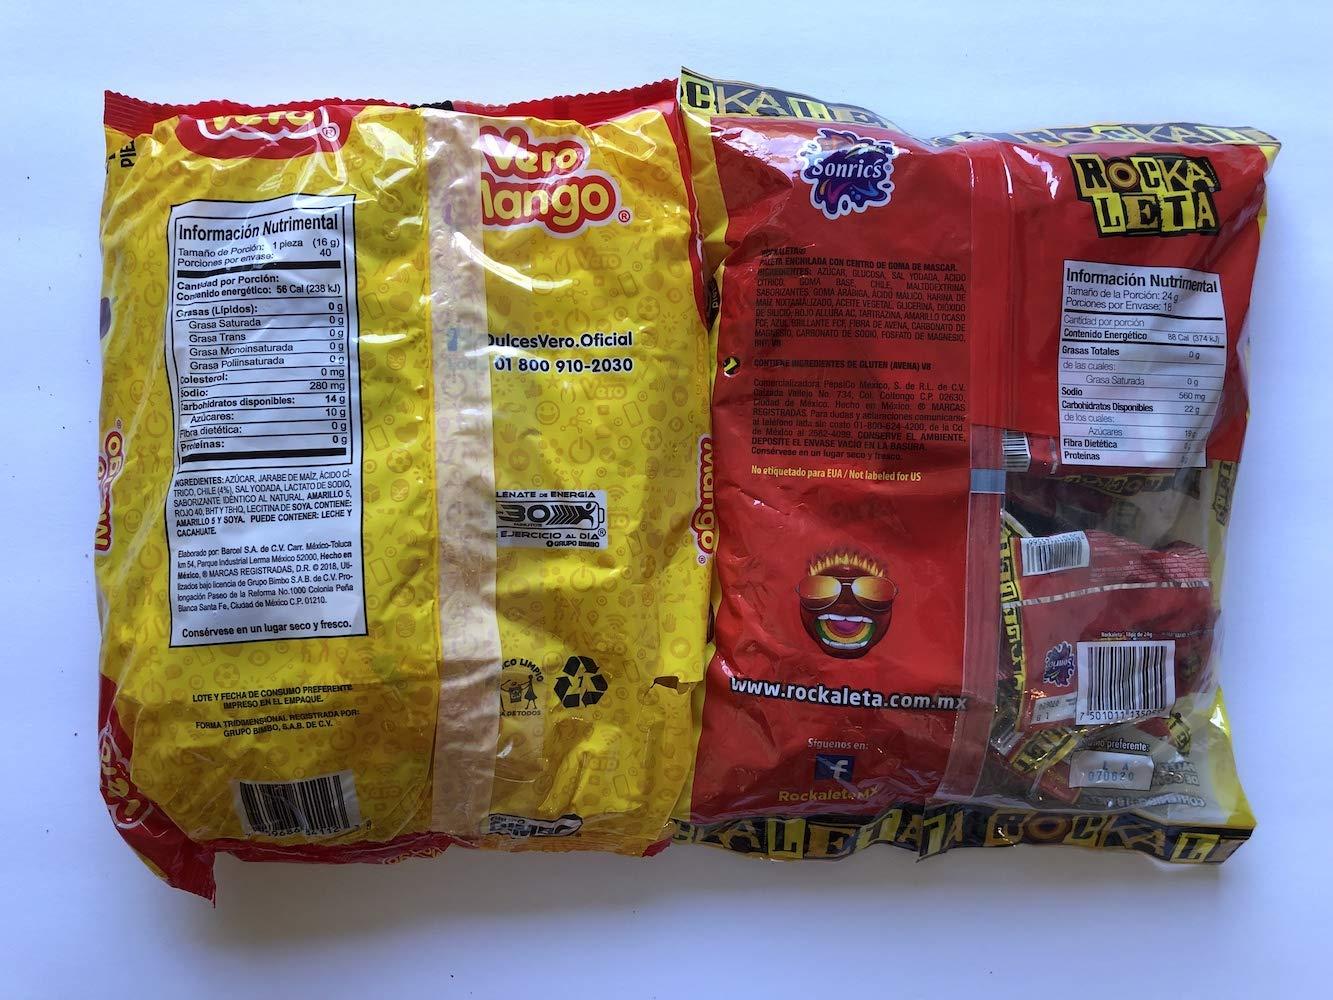 Amazon.com : Vero Mango and Rockaleta lollipop Bundle ...